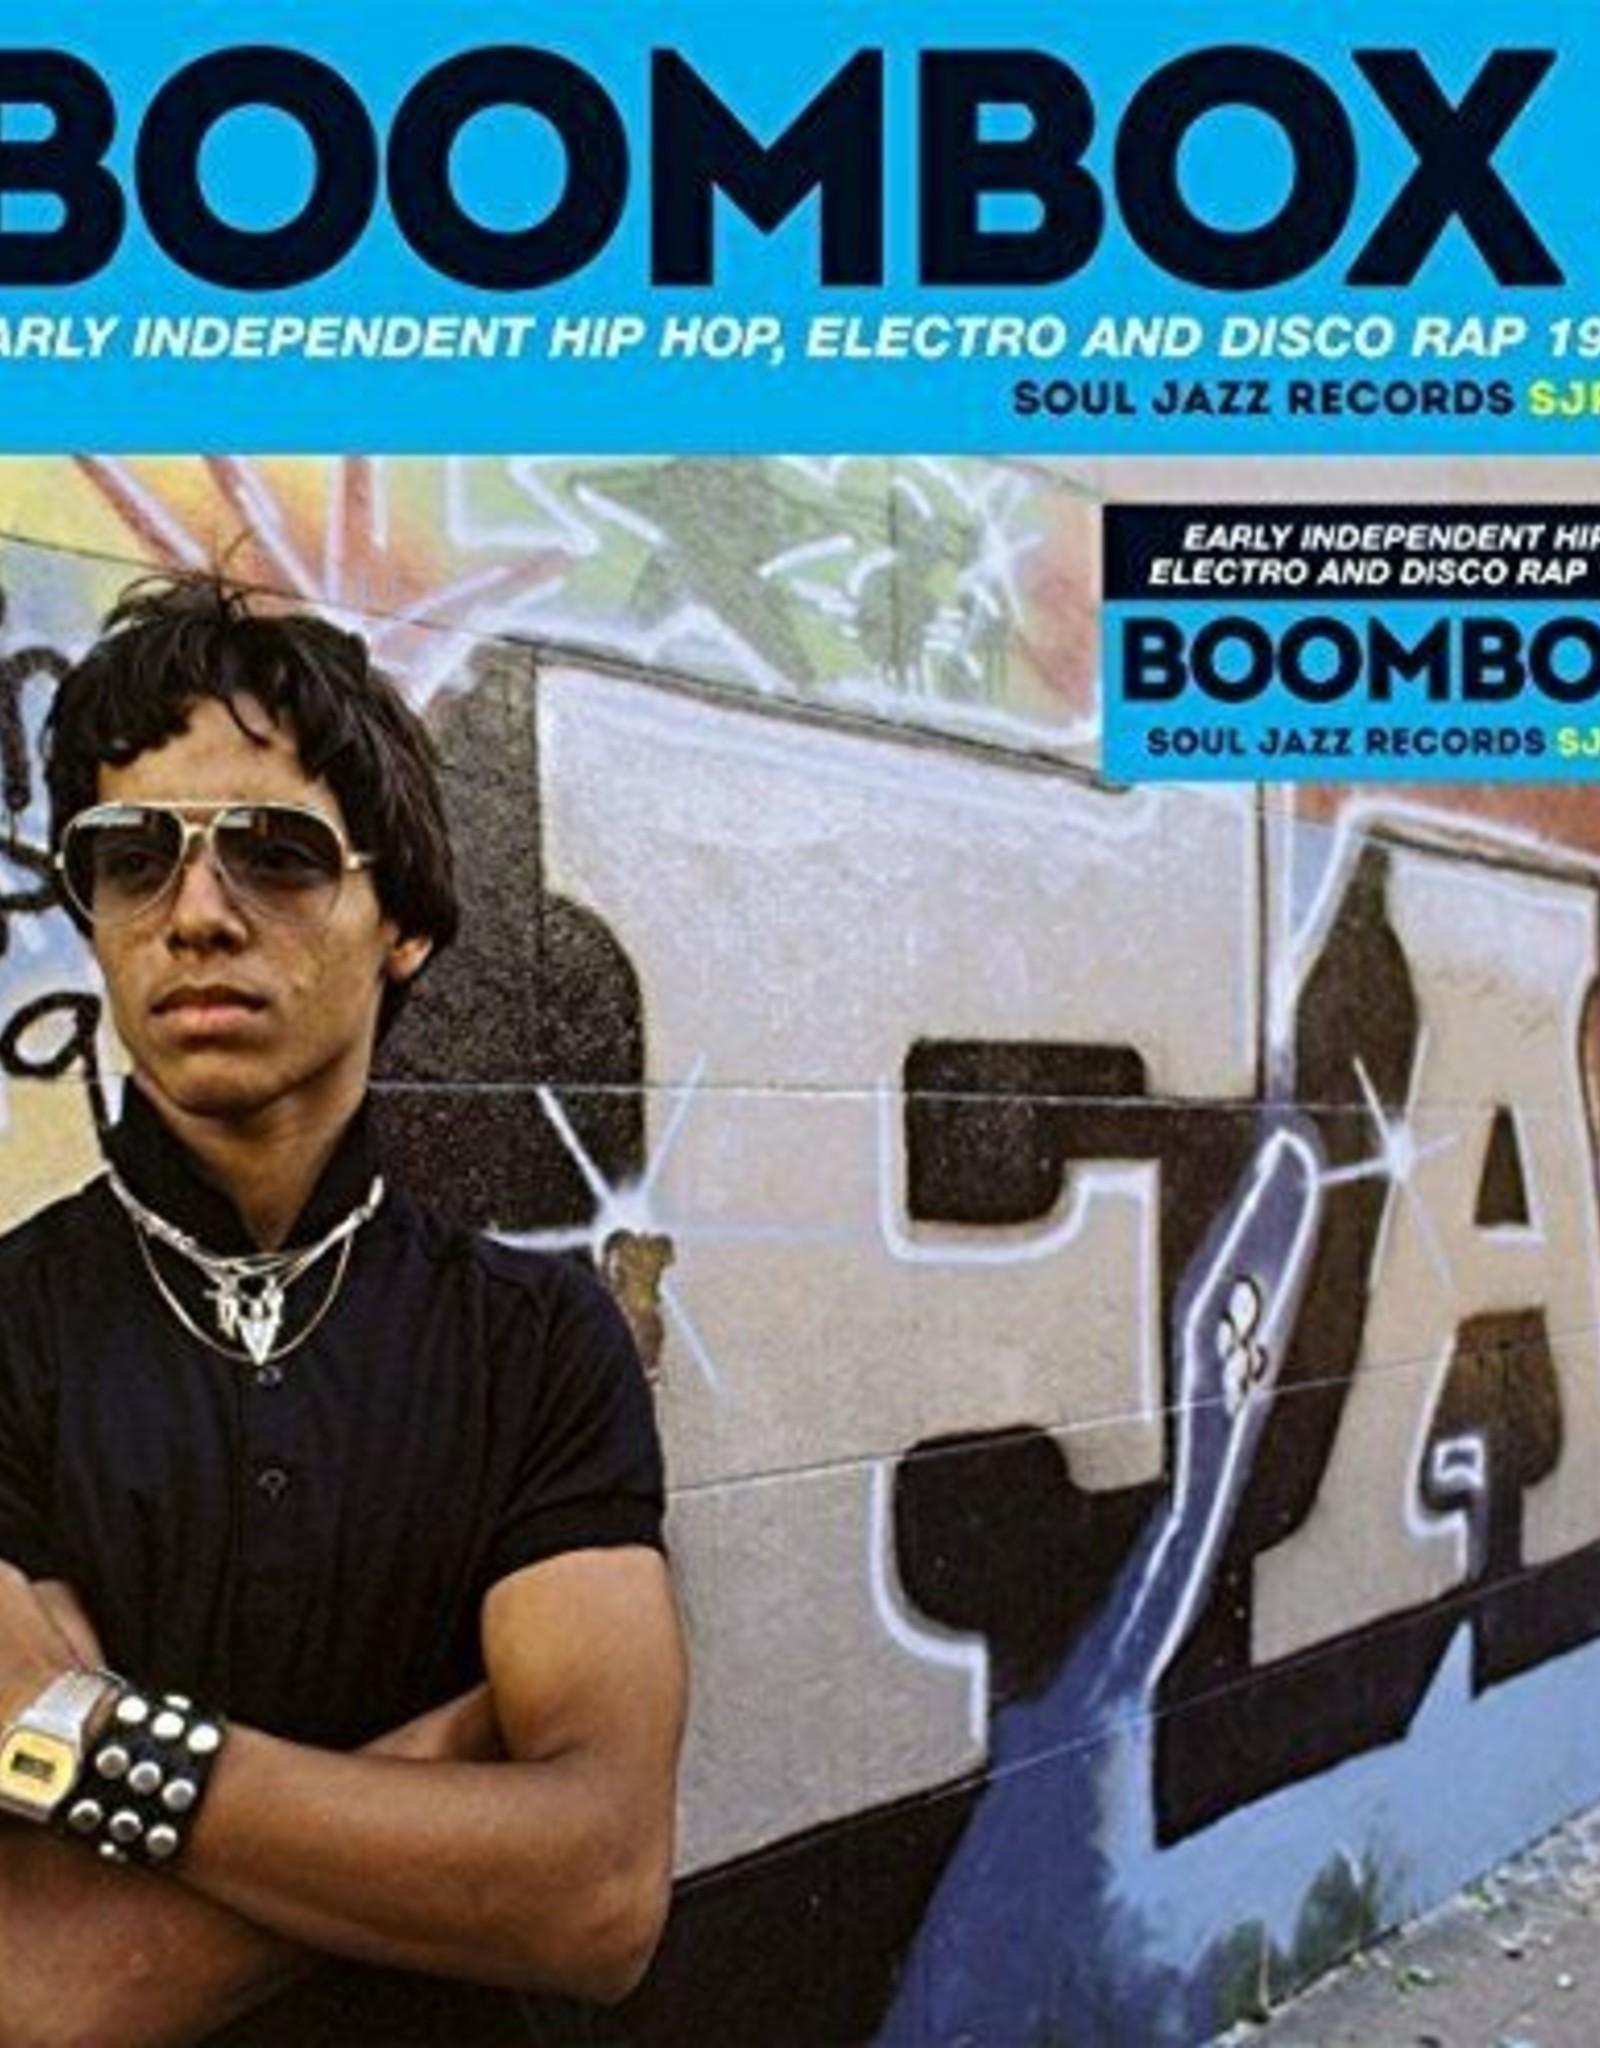 Soul Jazz Records Presents - Soul Jazz Records Presents Boombox 3: Early Indepen (Vinyl)